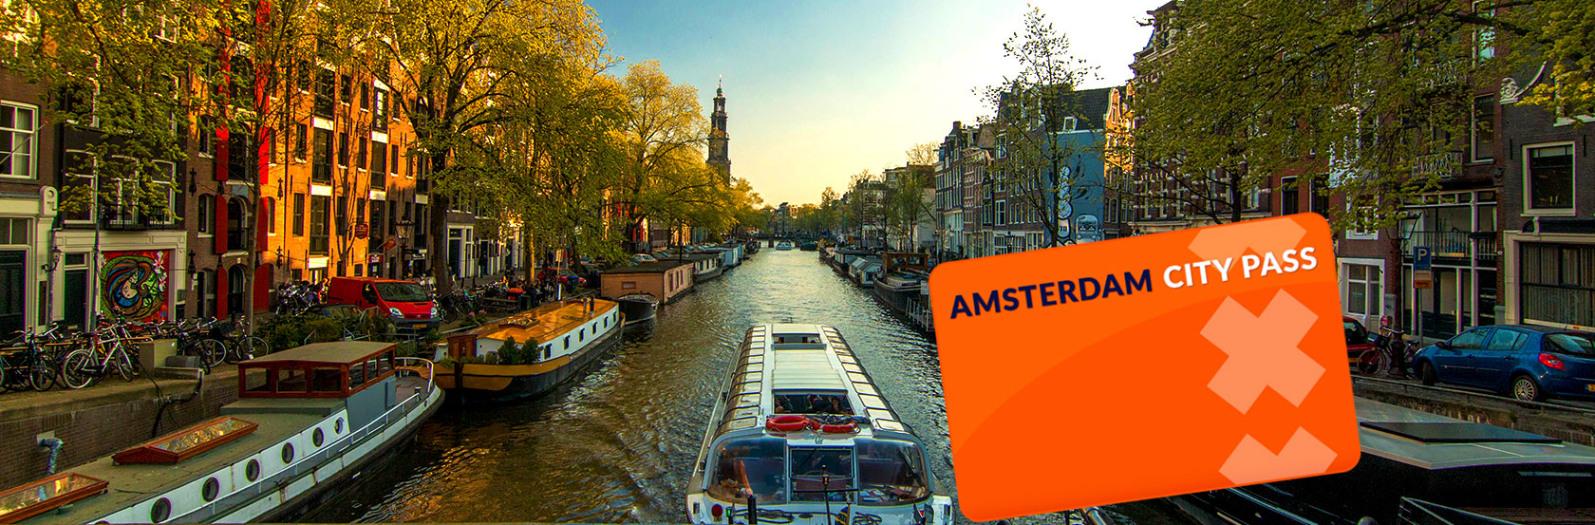 Ámsterdam City Pass Adarve Travel